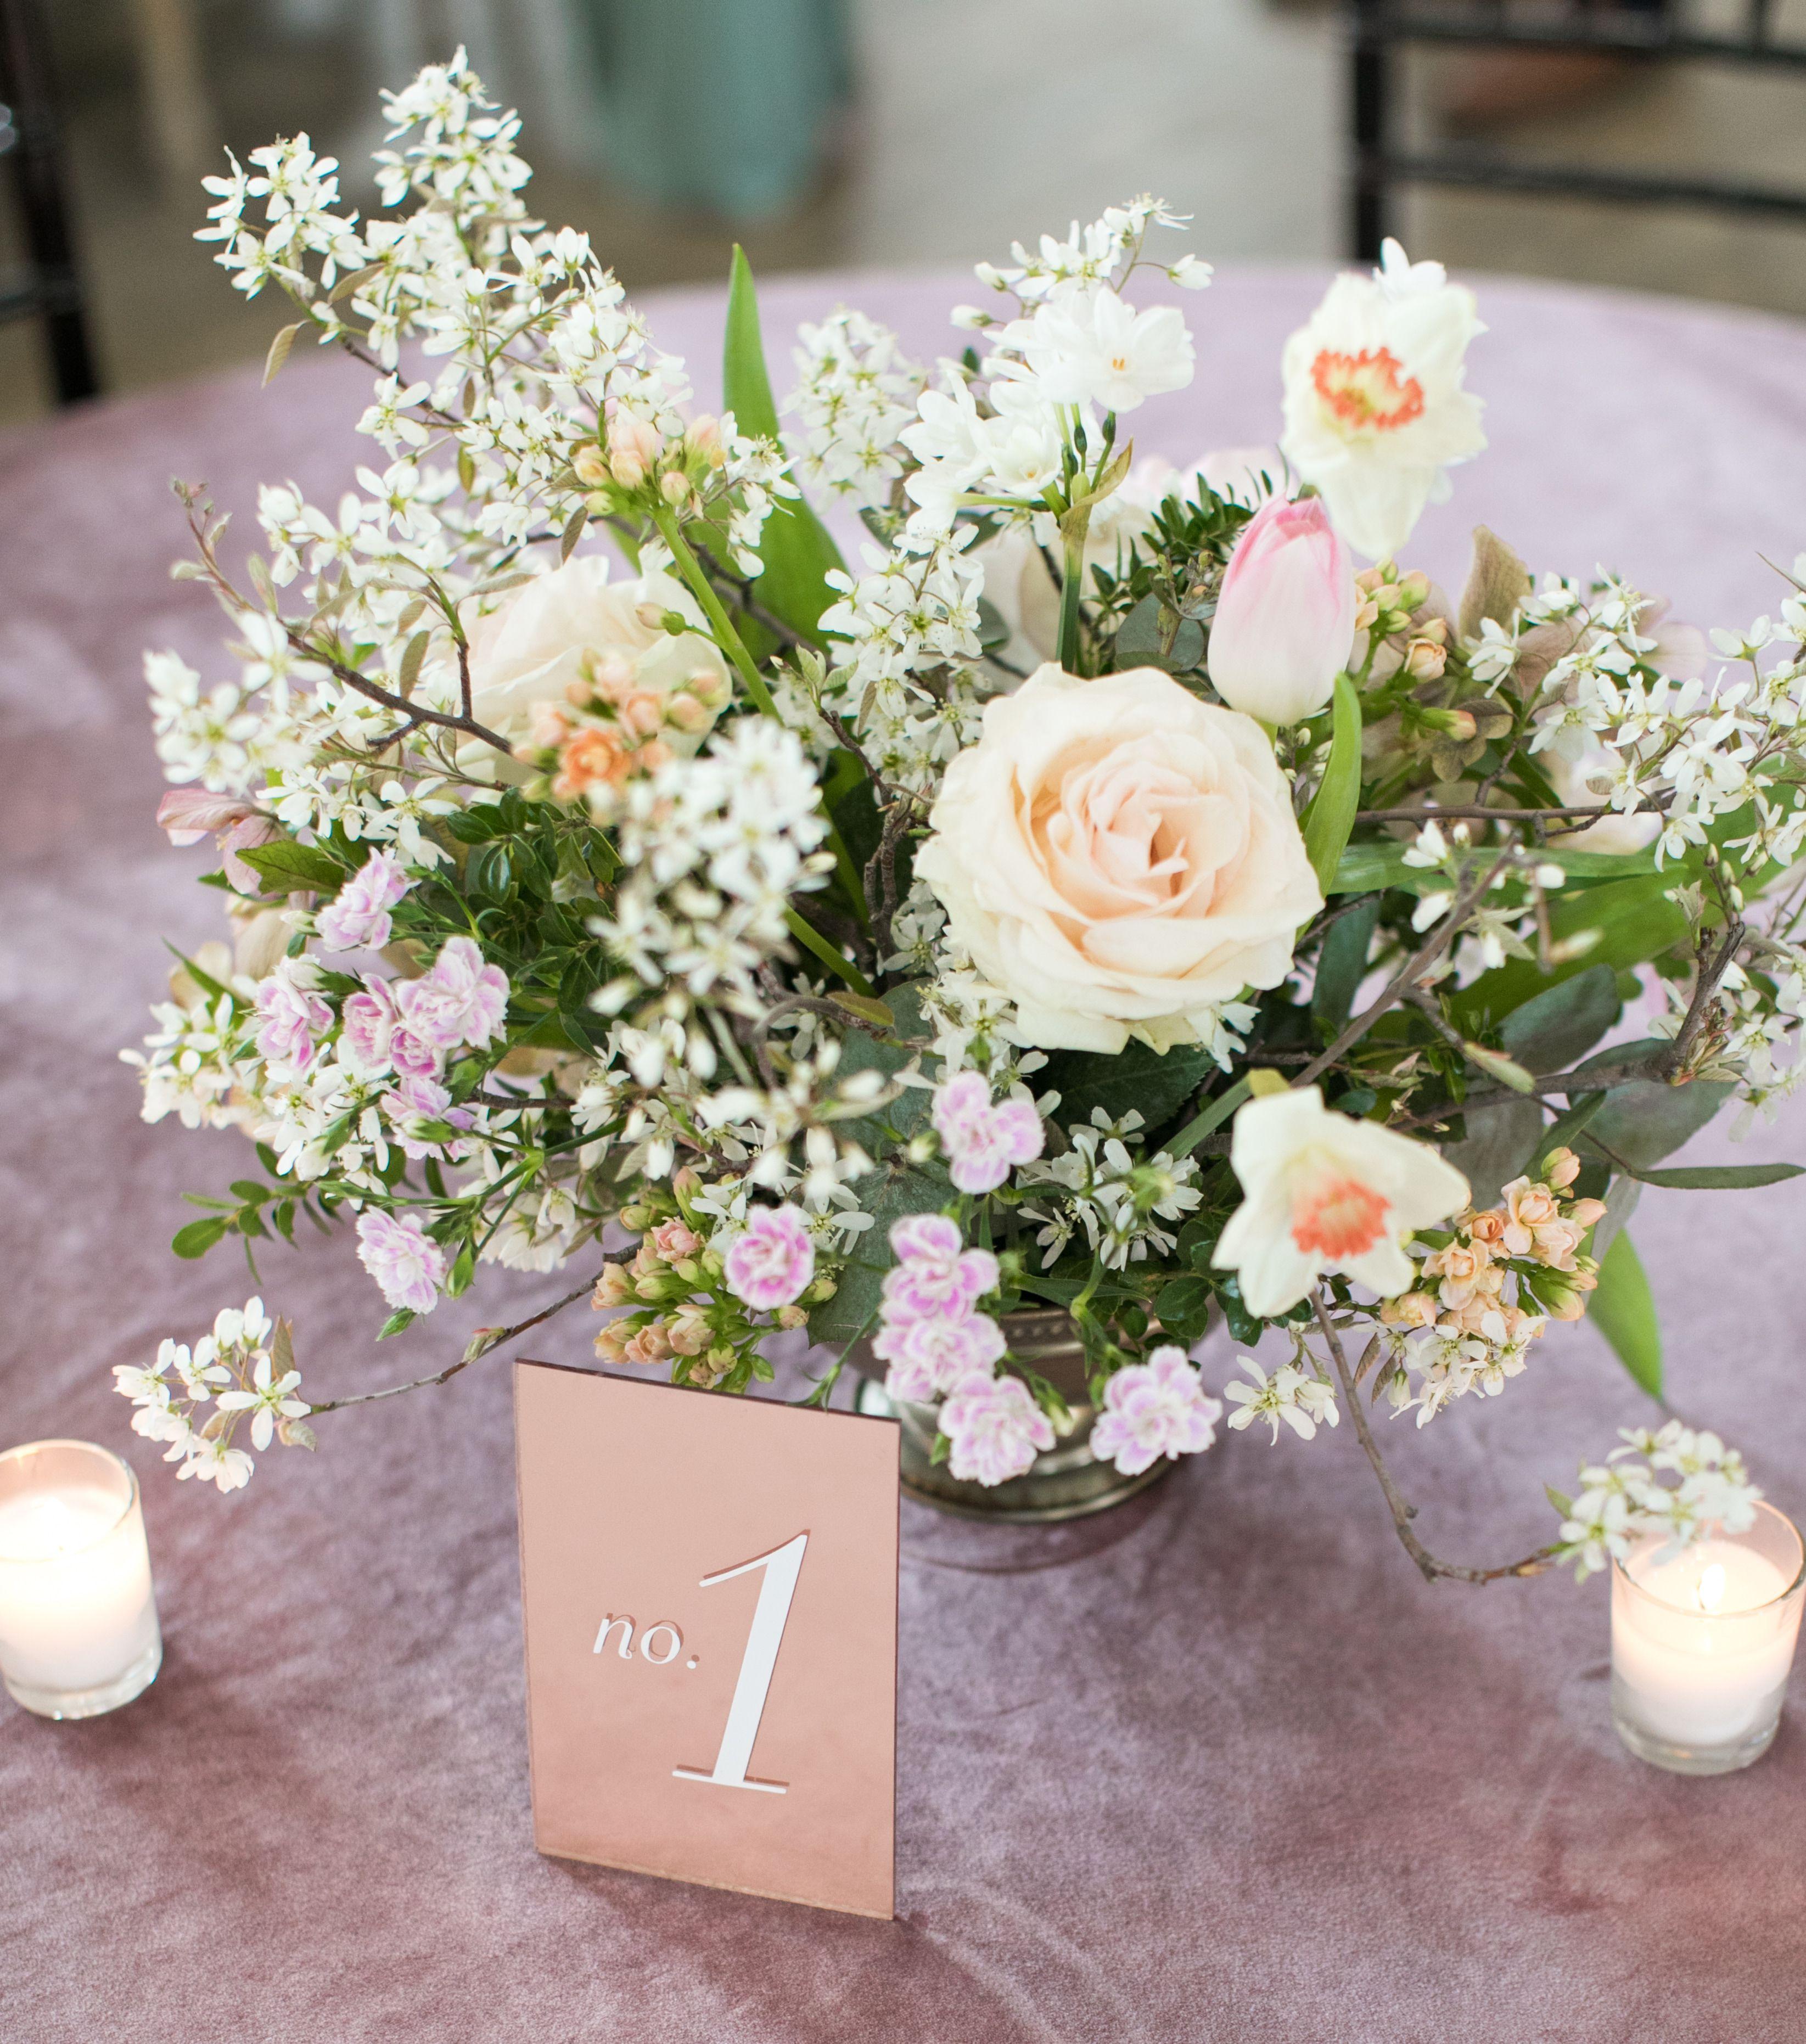 Rosewood Farms, Florist, NJ Florist, Aisle Decor